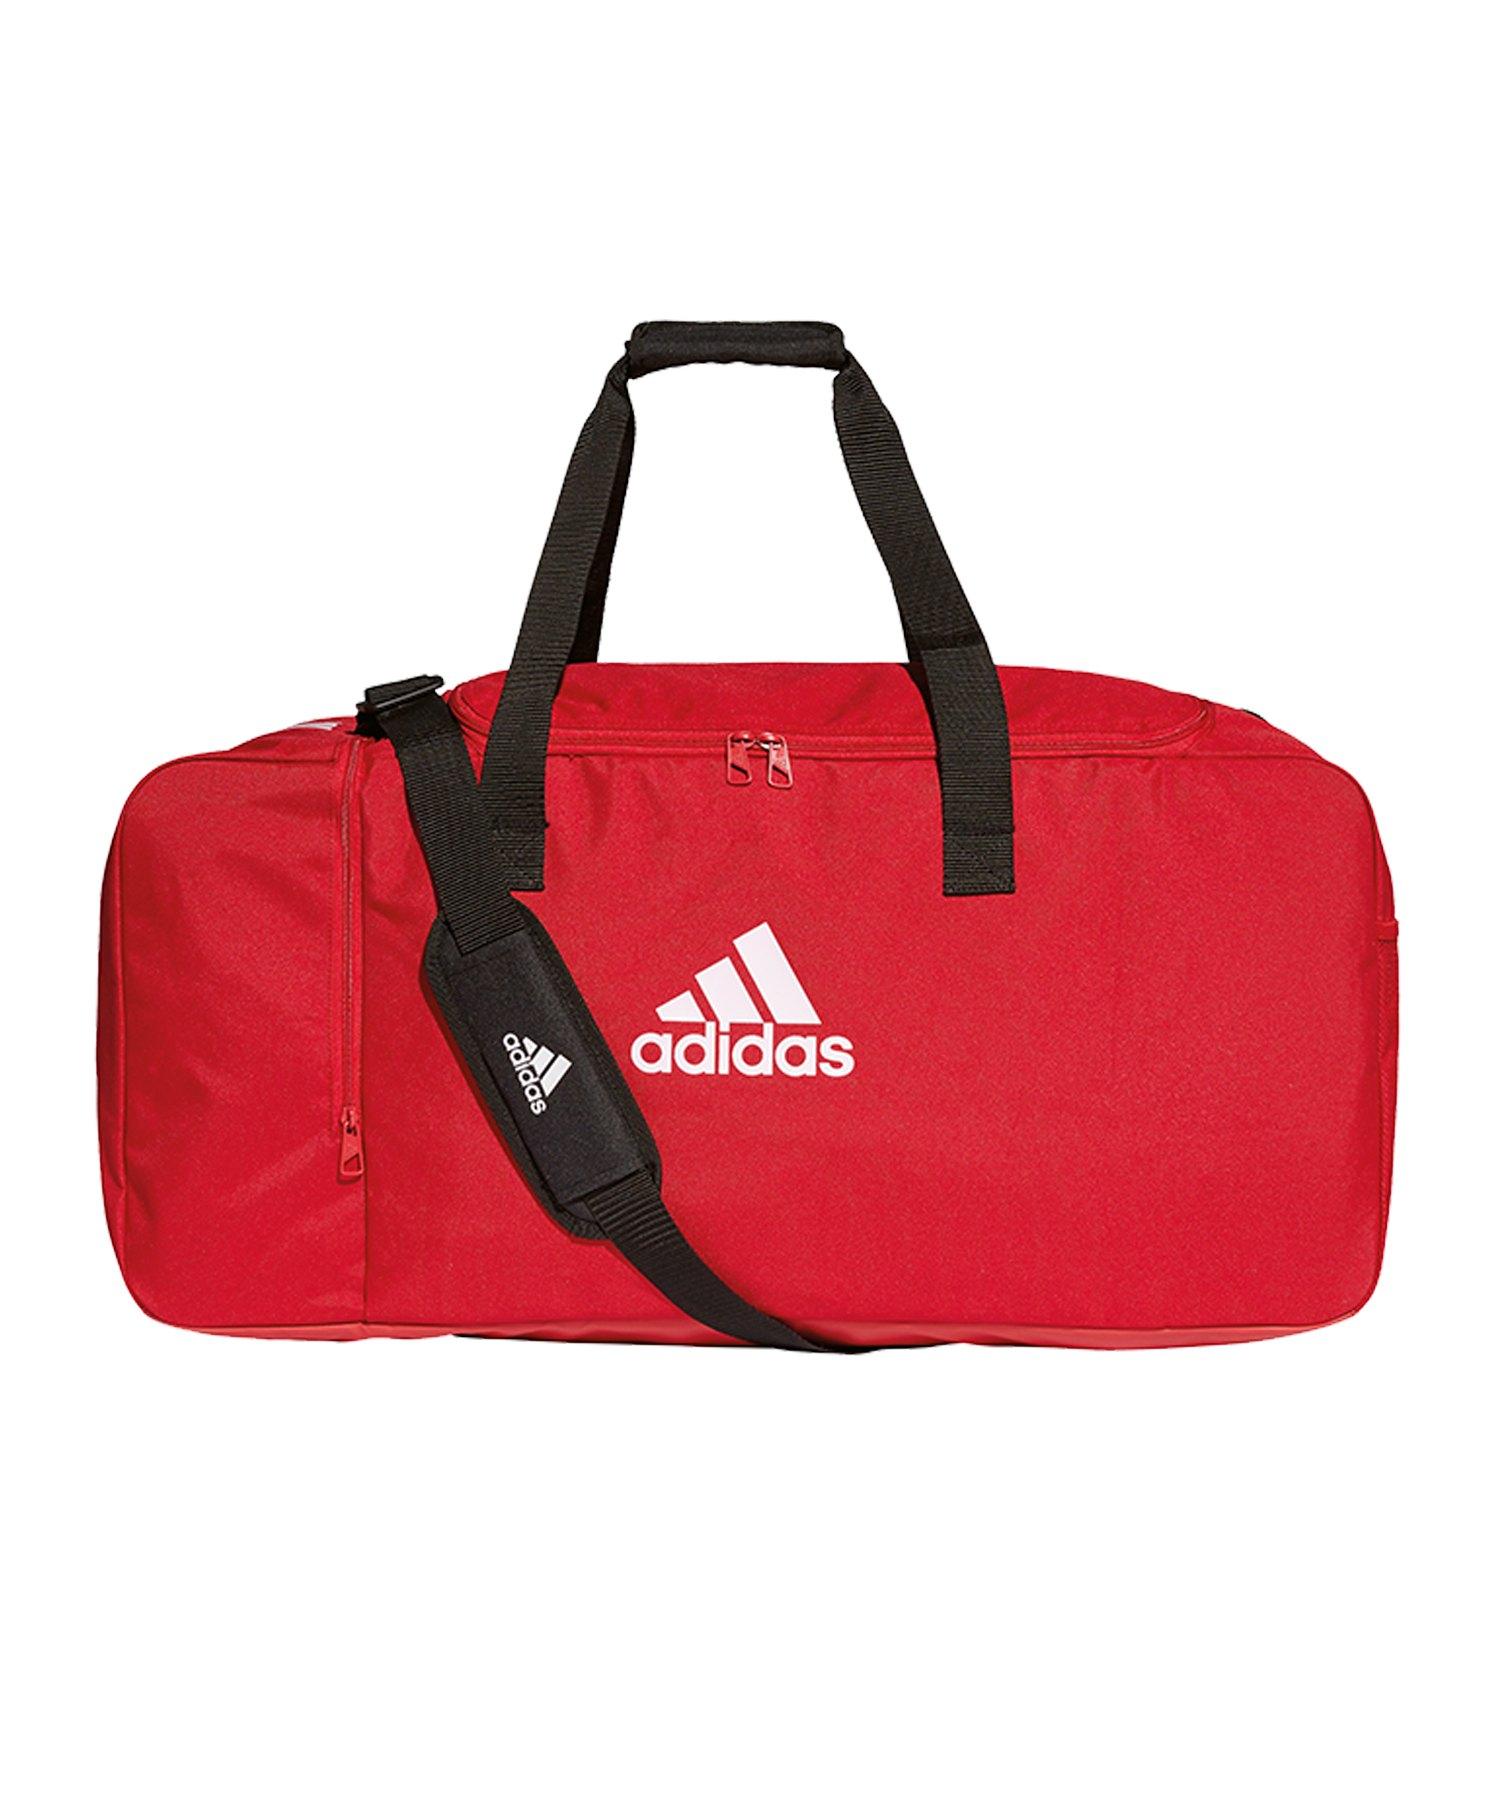 f548bf0a81c05 adidas Tiro Duffel Bag Gr. L Rot Weiss - rot